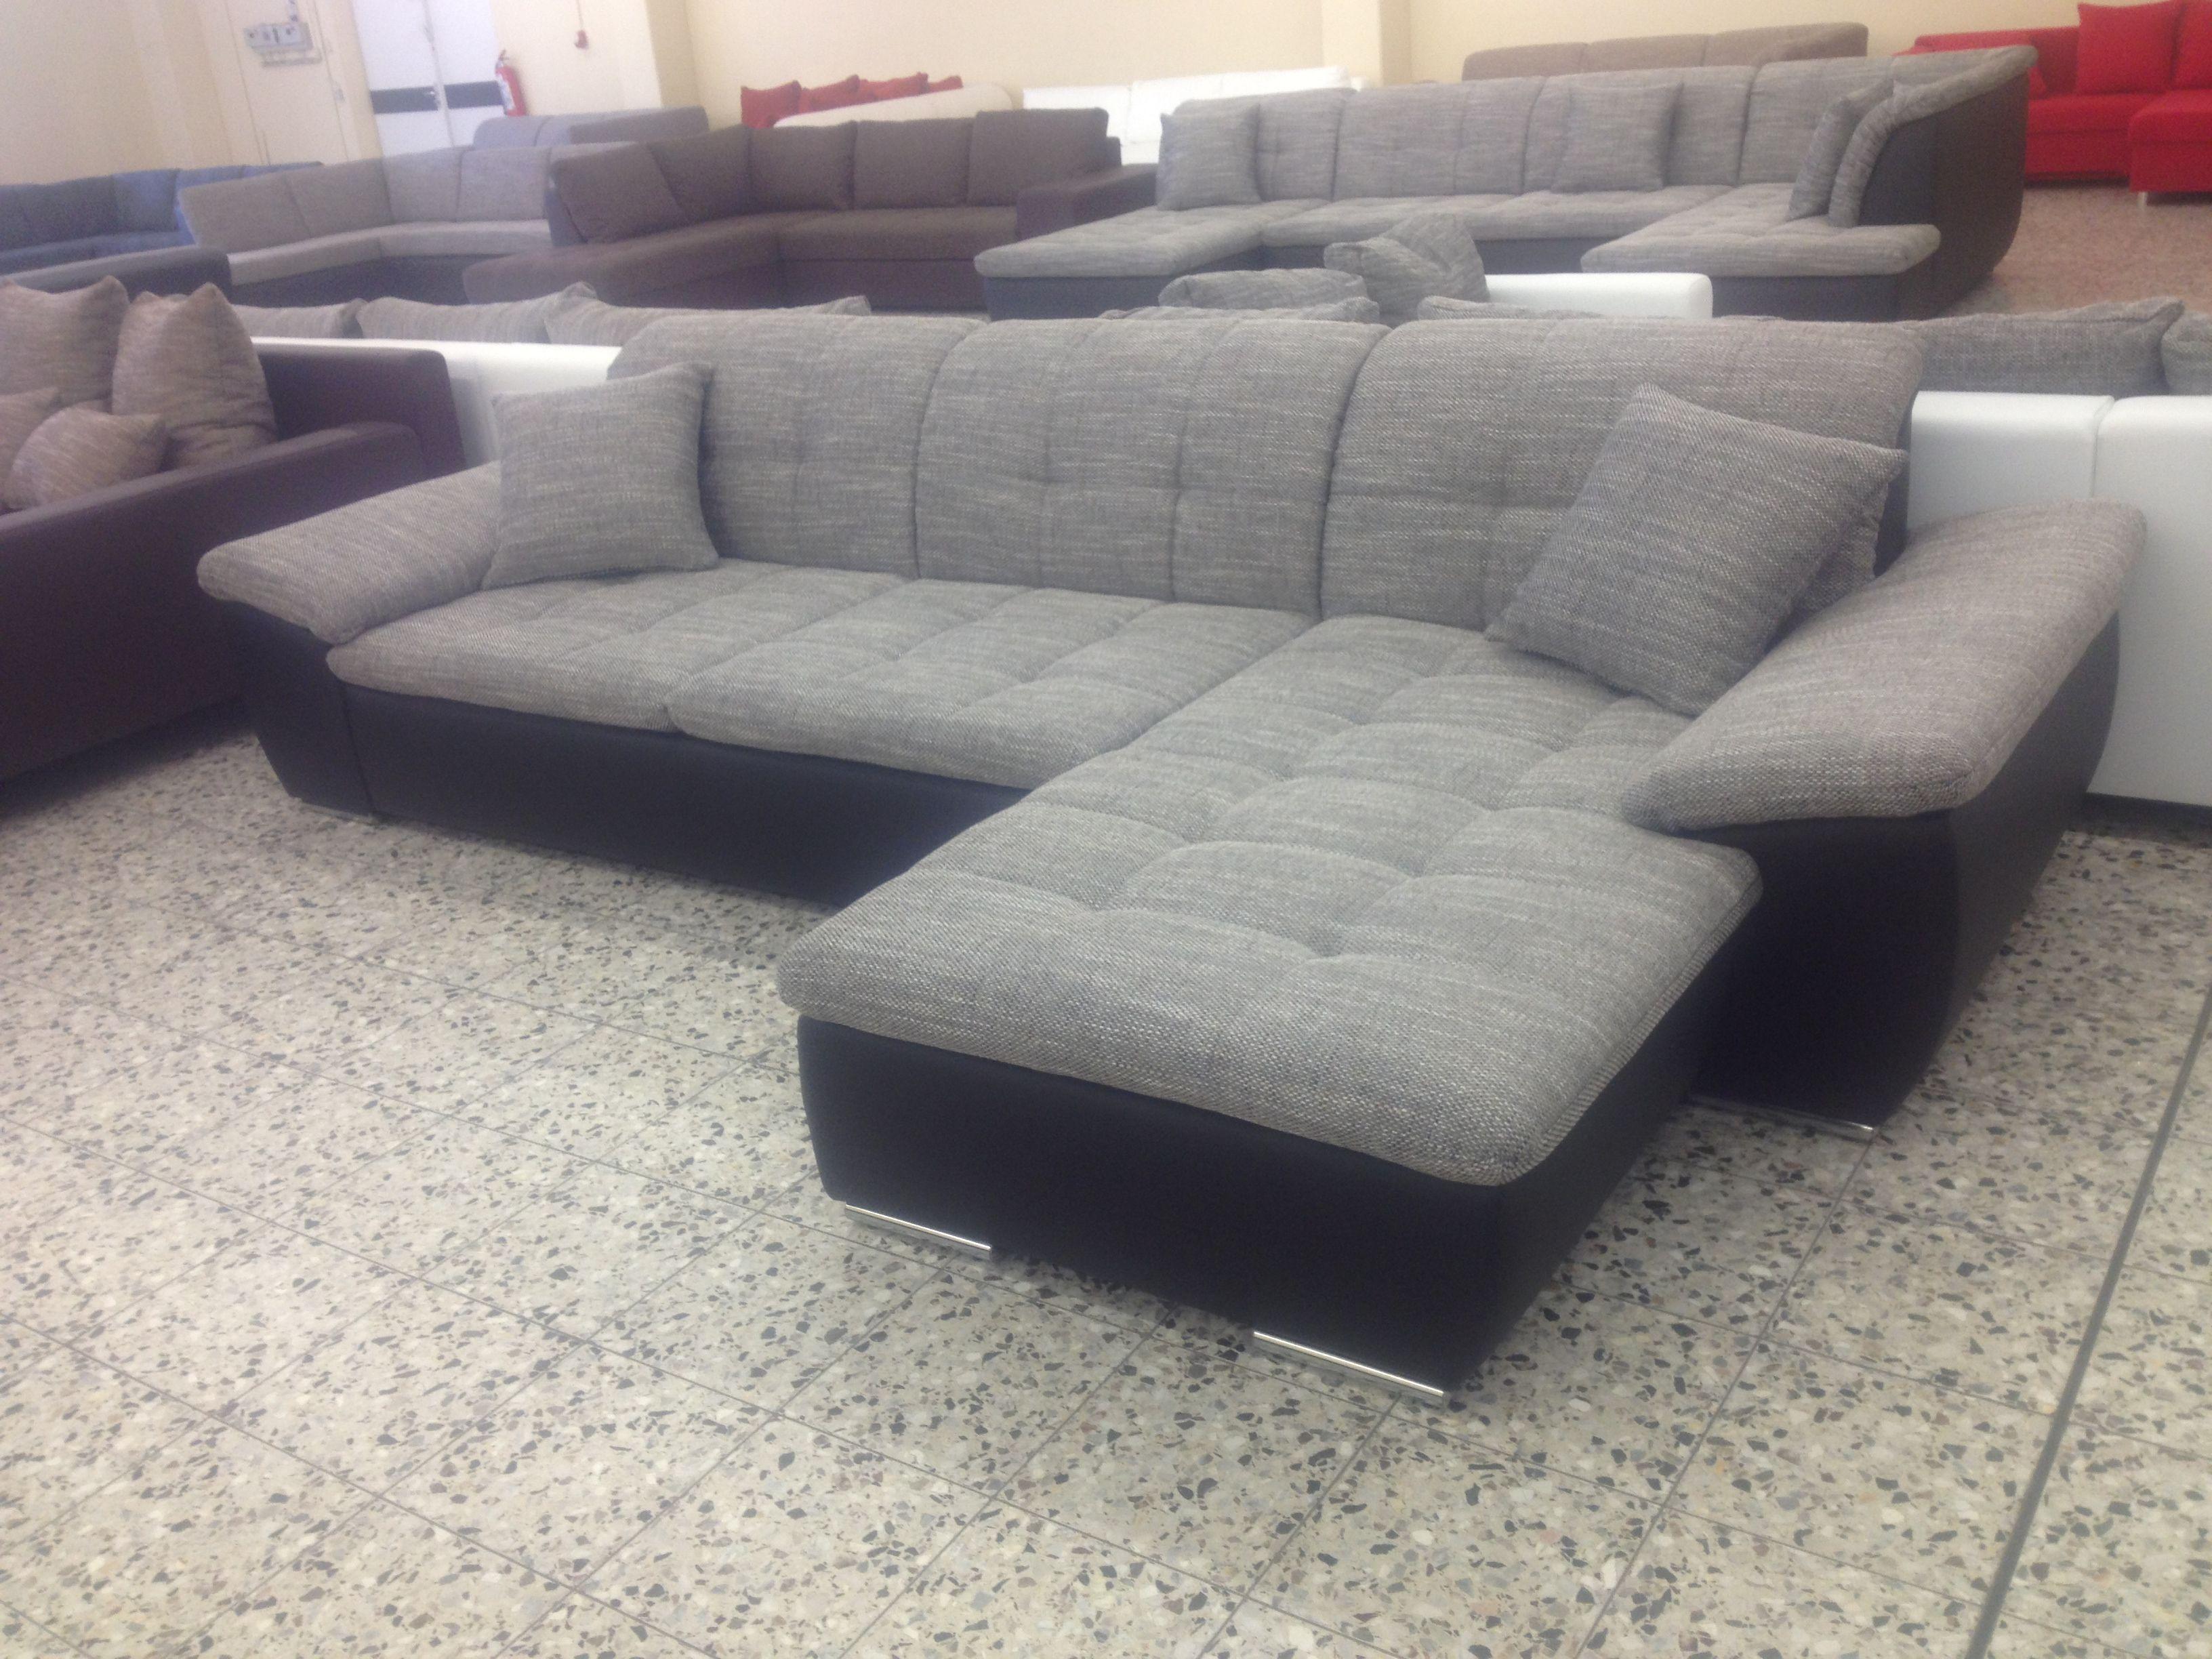 Sofa Lagerverkauf Fabrikverkauf Elkenroth Polstermobel Wohnlandschaften Trendsofas Sofas Sofort Ab Lager Www Sofa Laverk Couch Wohnlandschaft Sofa Sofa Couch